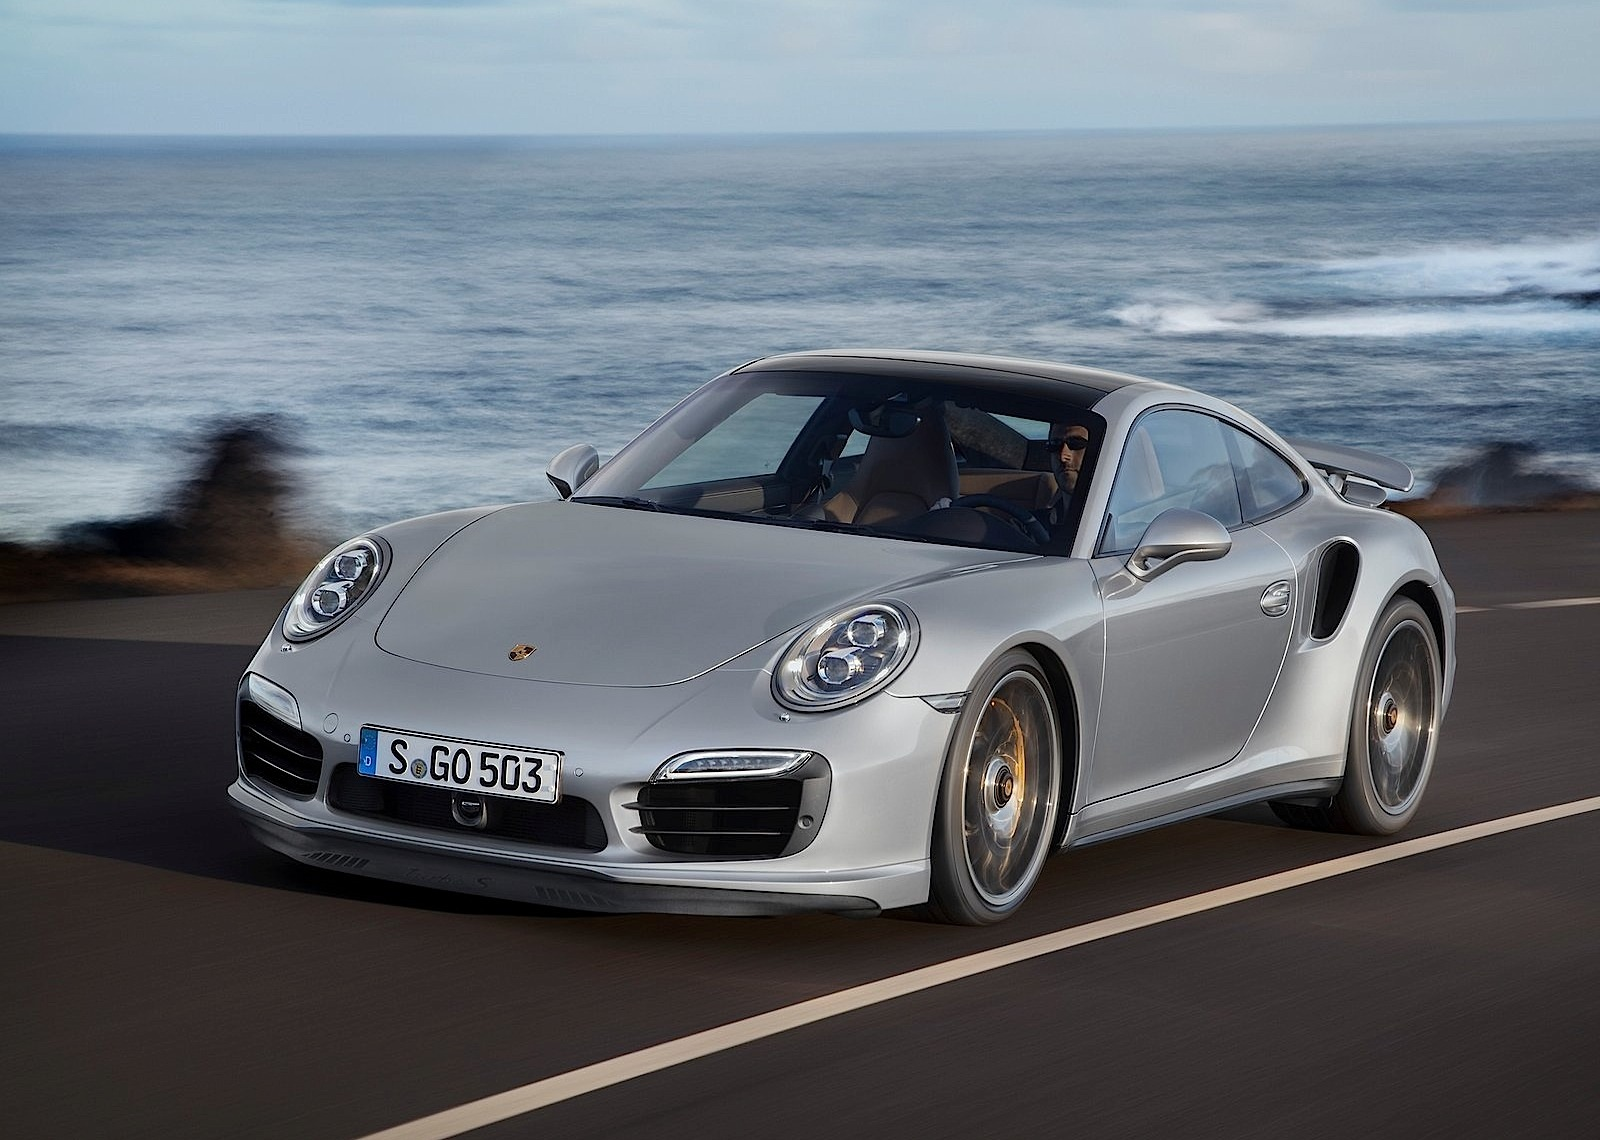 porsche 911 turbo s 991 specs 2013 2014 2015 2016 autoevolution. Black Bedroom Furniture Sets. Home Design Ideas